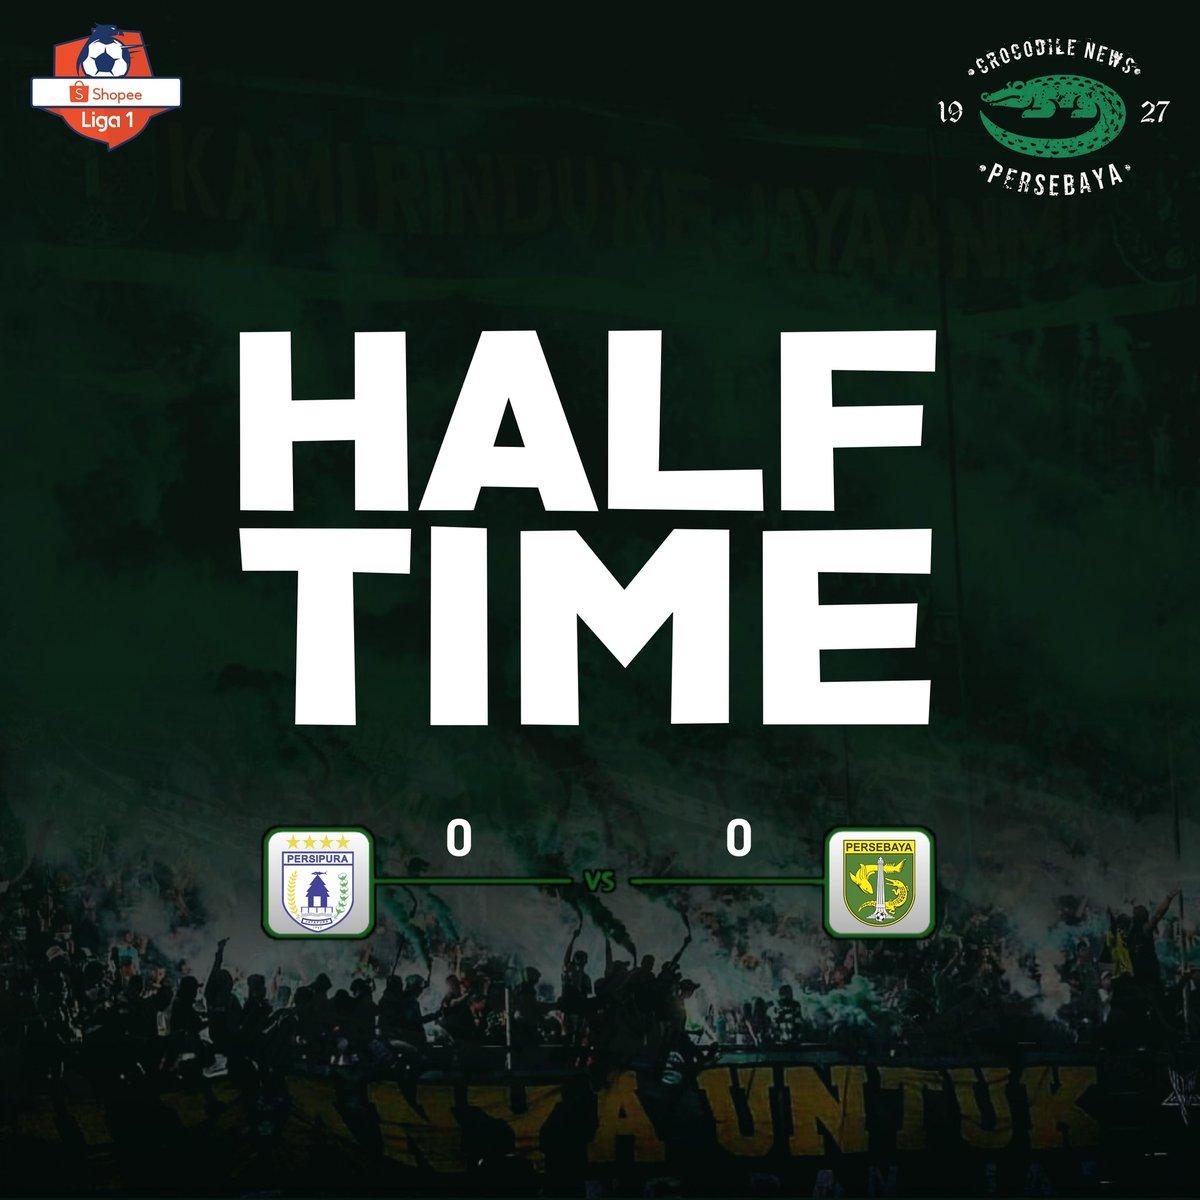 Half Time: Persipura 0-0 Persebaya  Masih sama-sama kuat dibabak pertama! Permainan dibabak pertama cukup biasa aja, belum ada peluang yang cukup membahayakan.  #Persebaya #bajolijo #greenforce #CrocodileNews #bonek #bonita #PersebayaDay